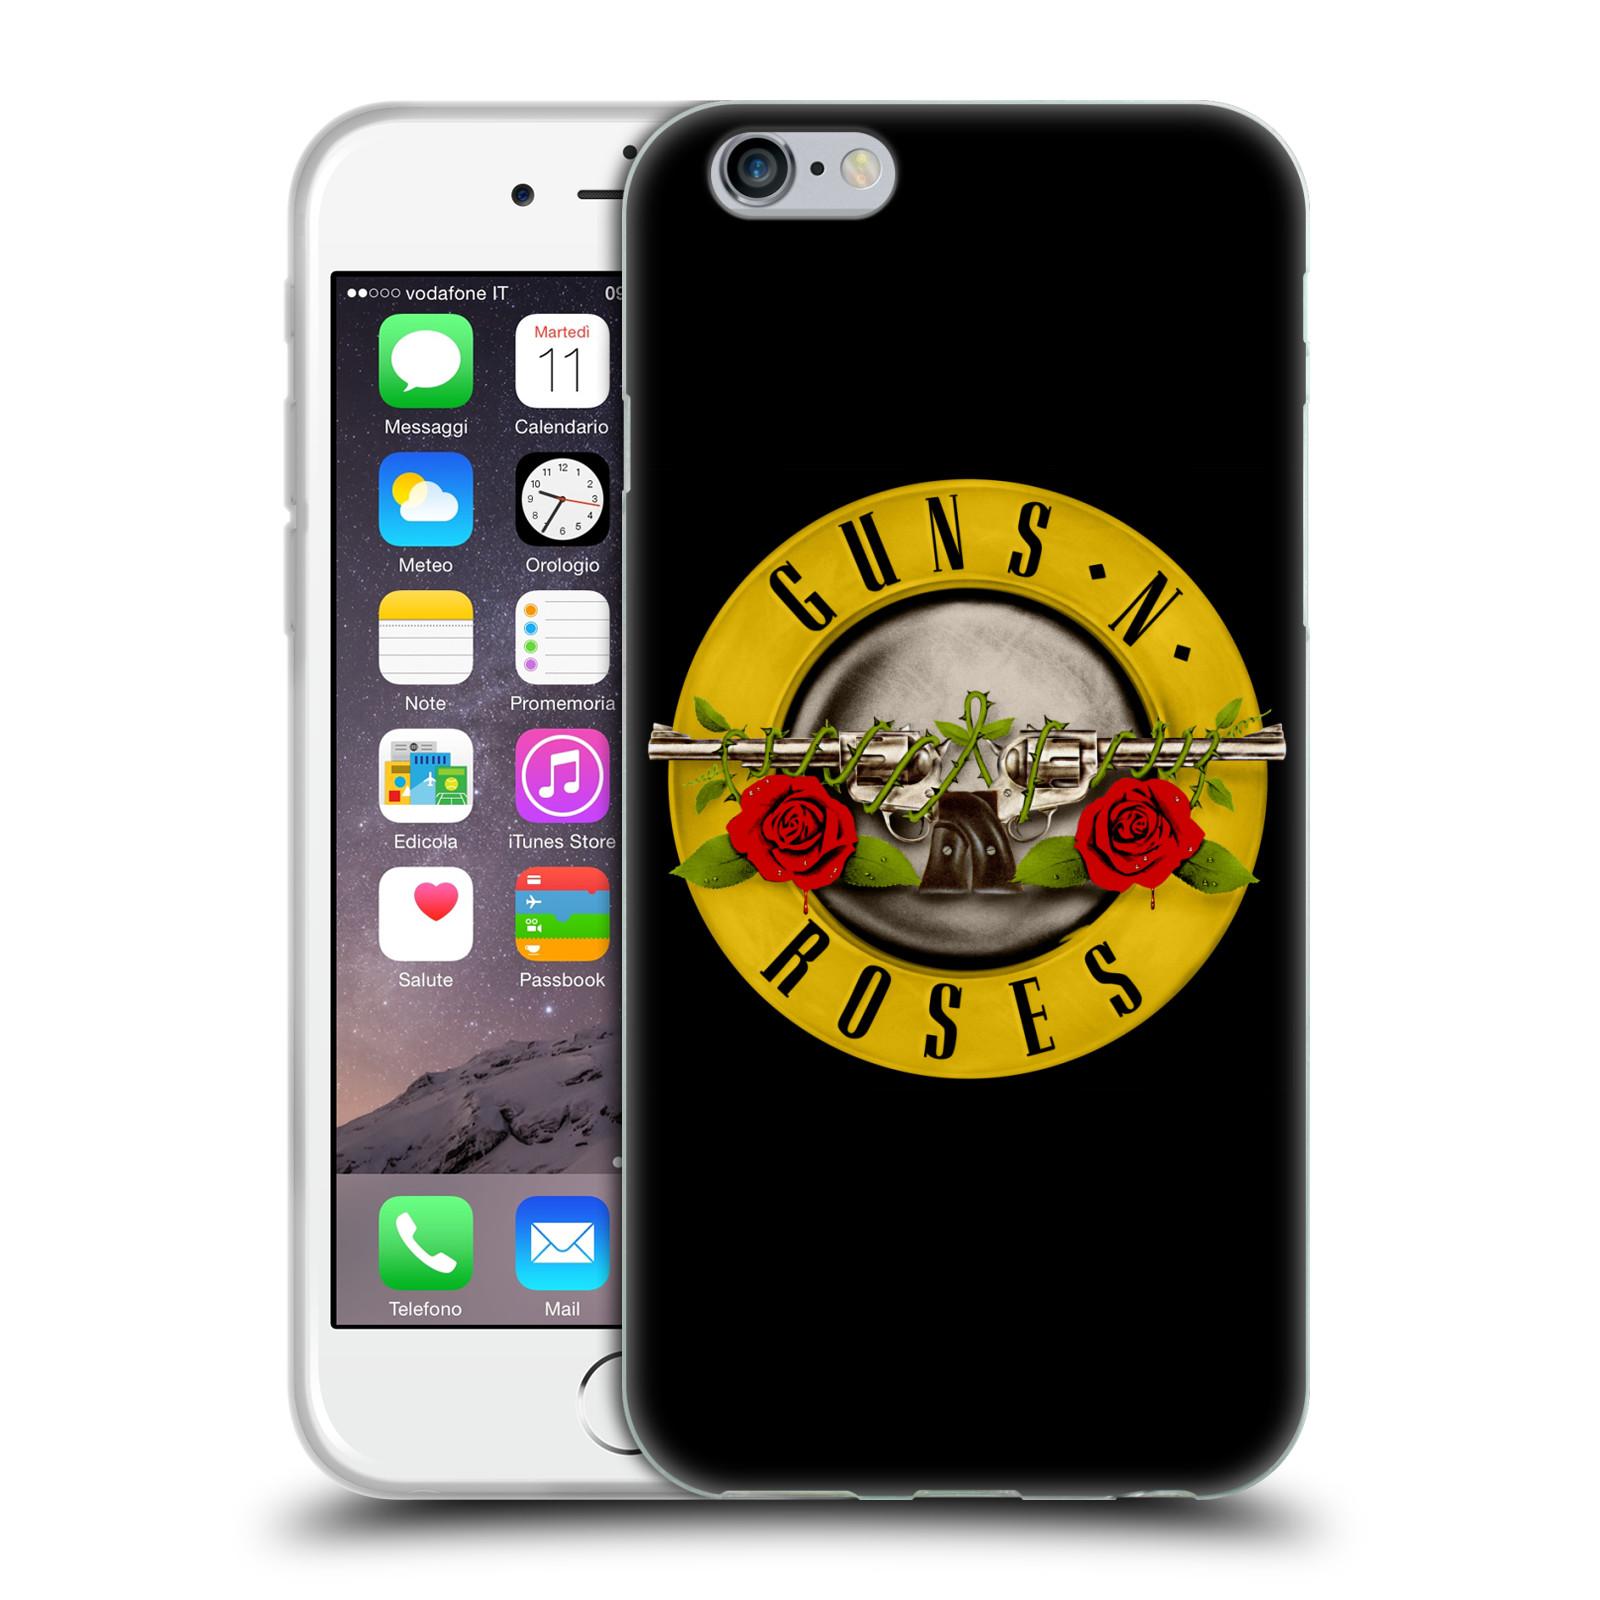 3ab12ea59 Silikonové pouzdro na mobil Apple iPhone 6 HEAD CASE Guns N' Roses - Logo